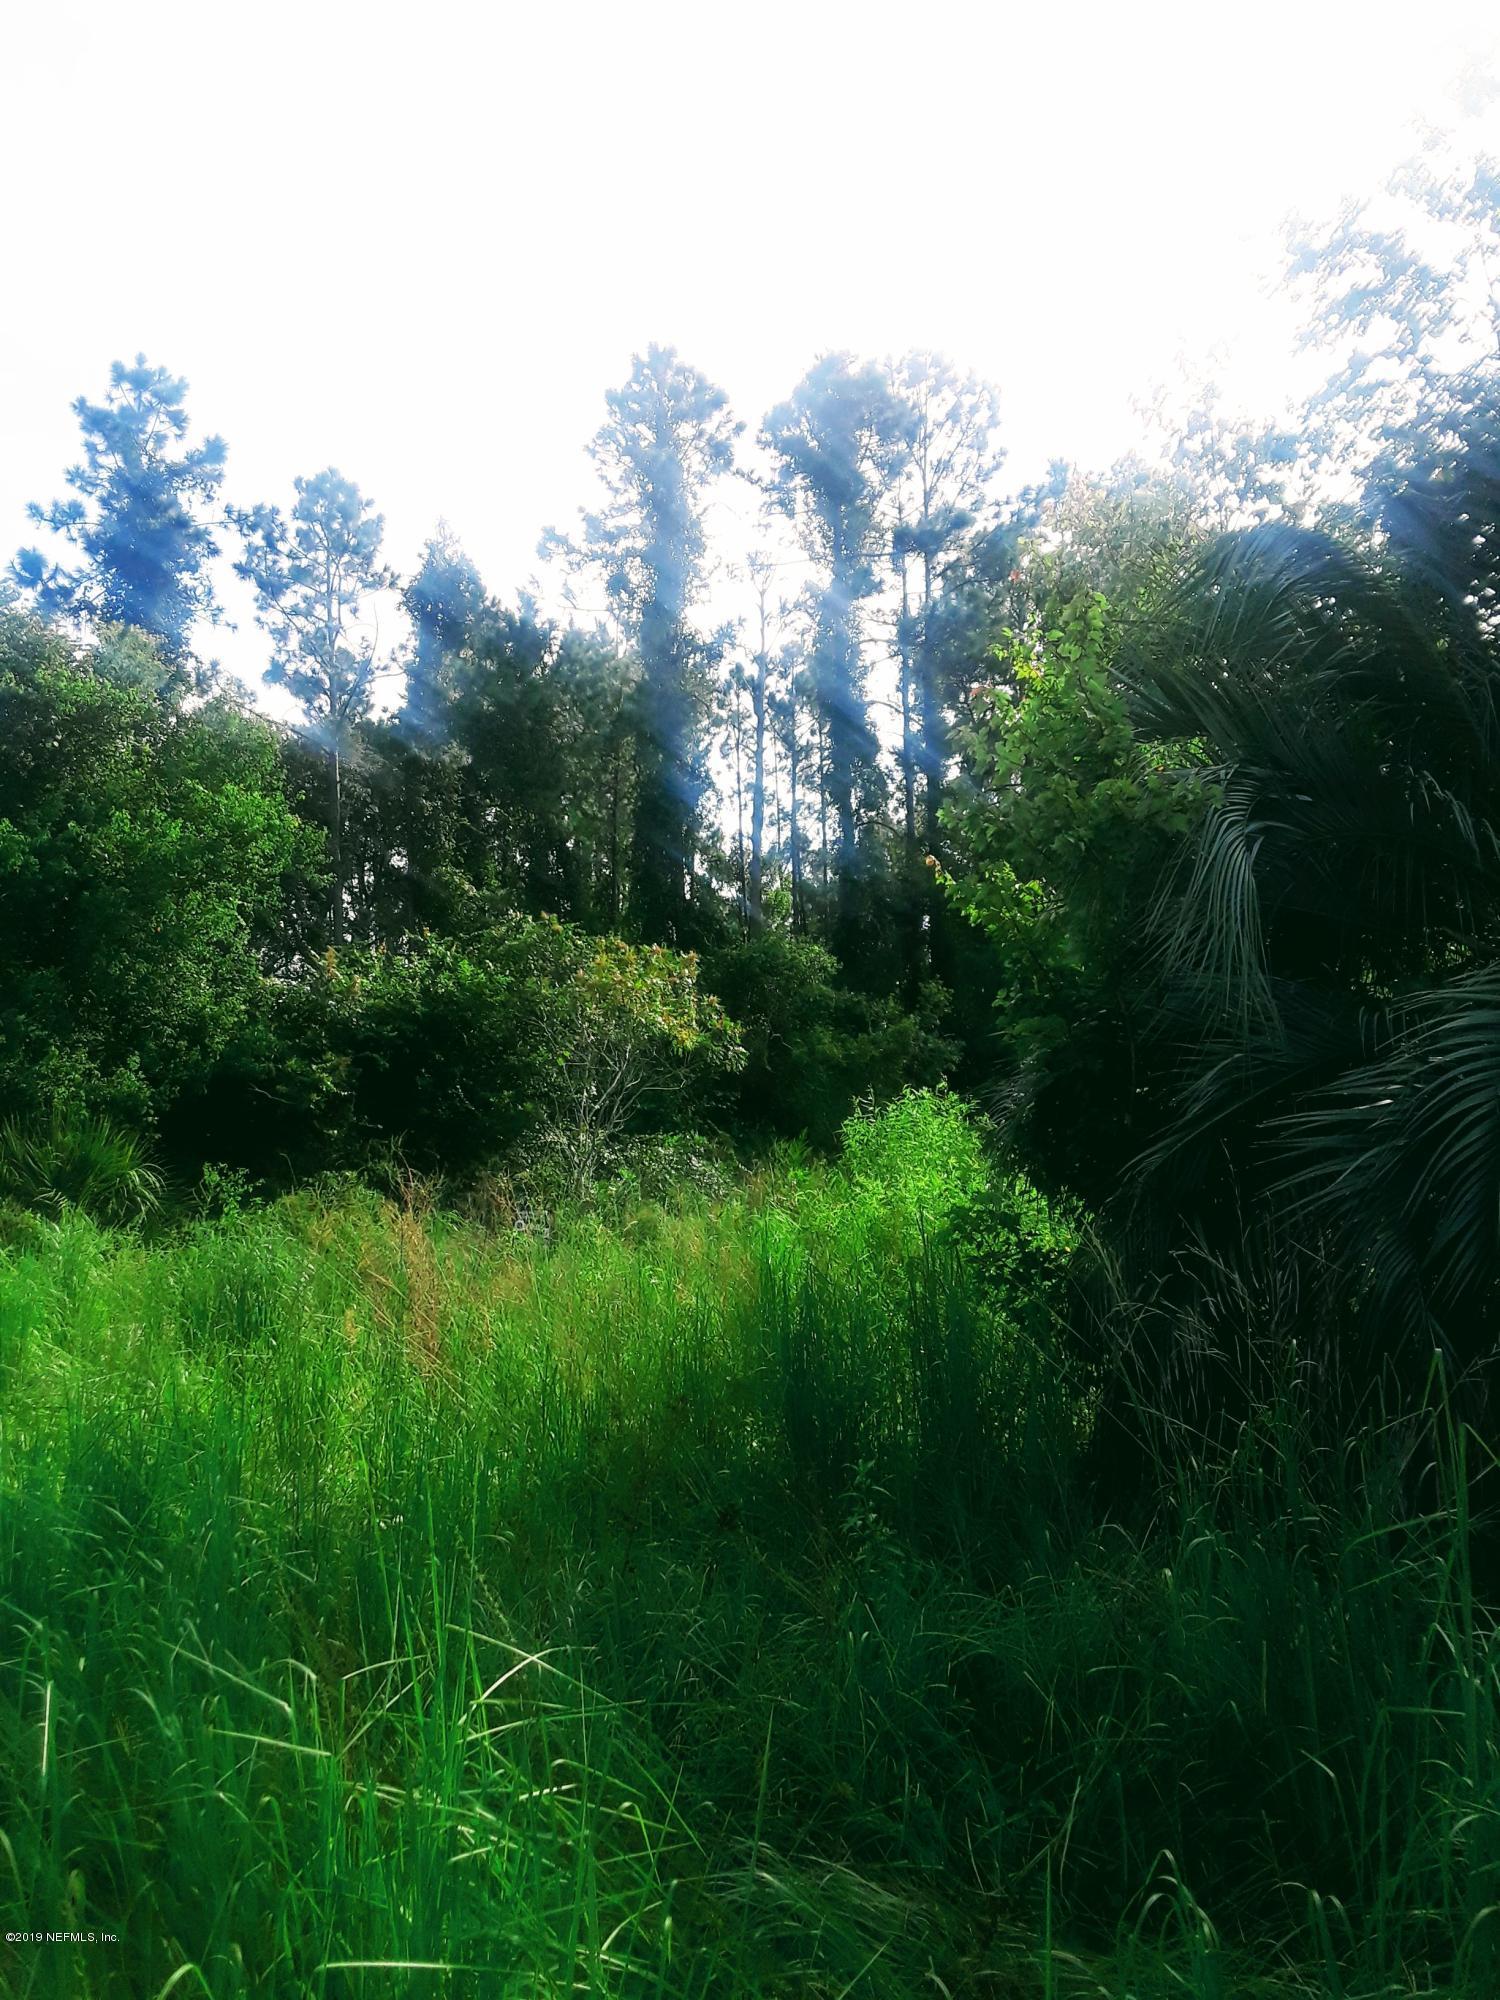 108 TIMBERWOOD, EAST PALATKA, FLORIDA 32131, ,Vacant land,For sale,TIMBERWOOD,949914